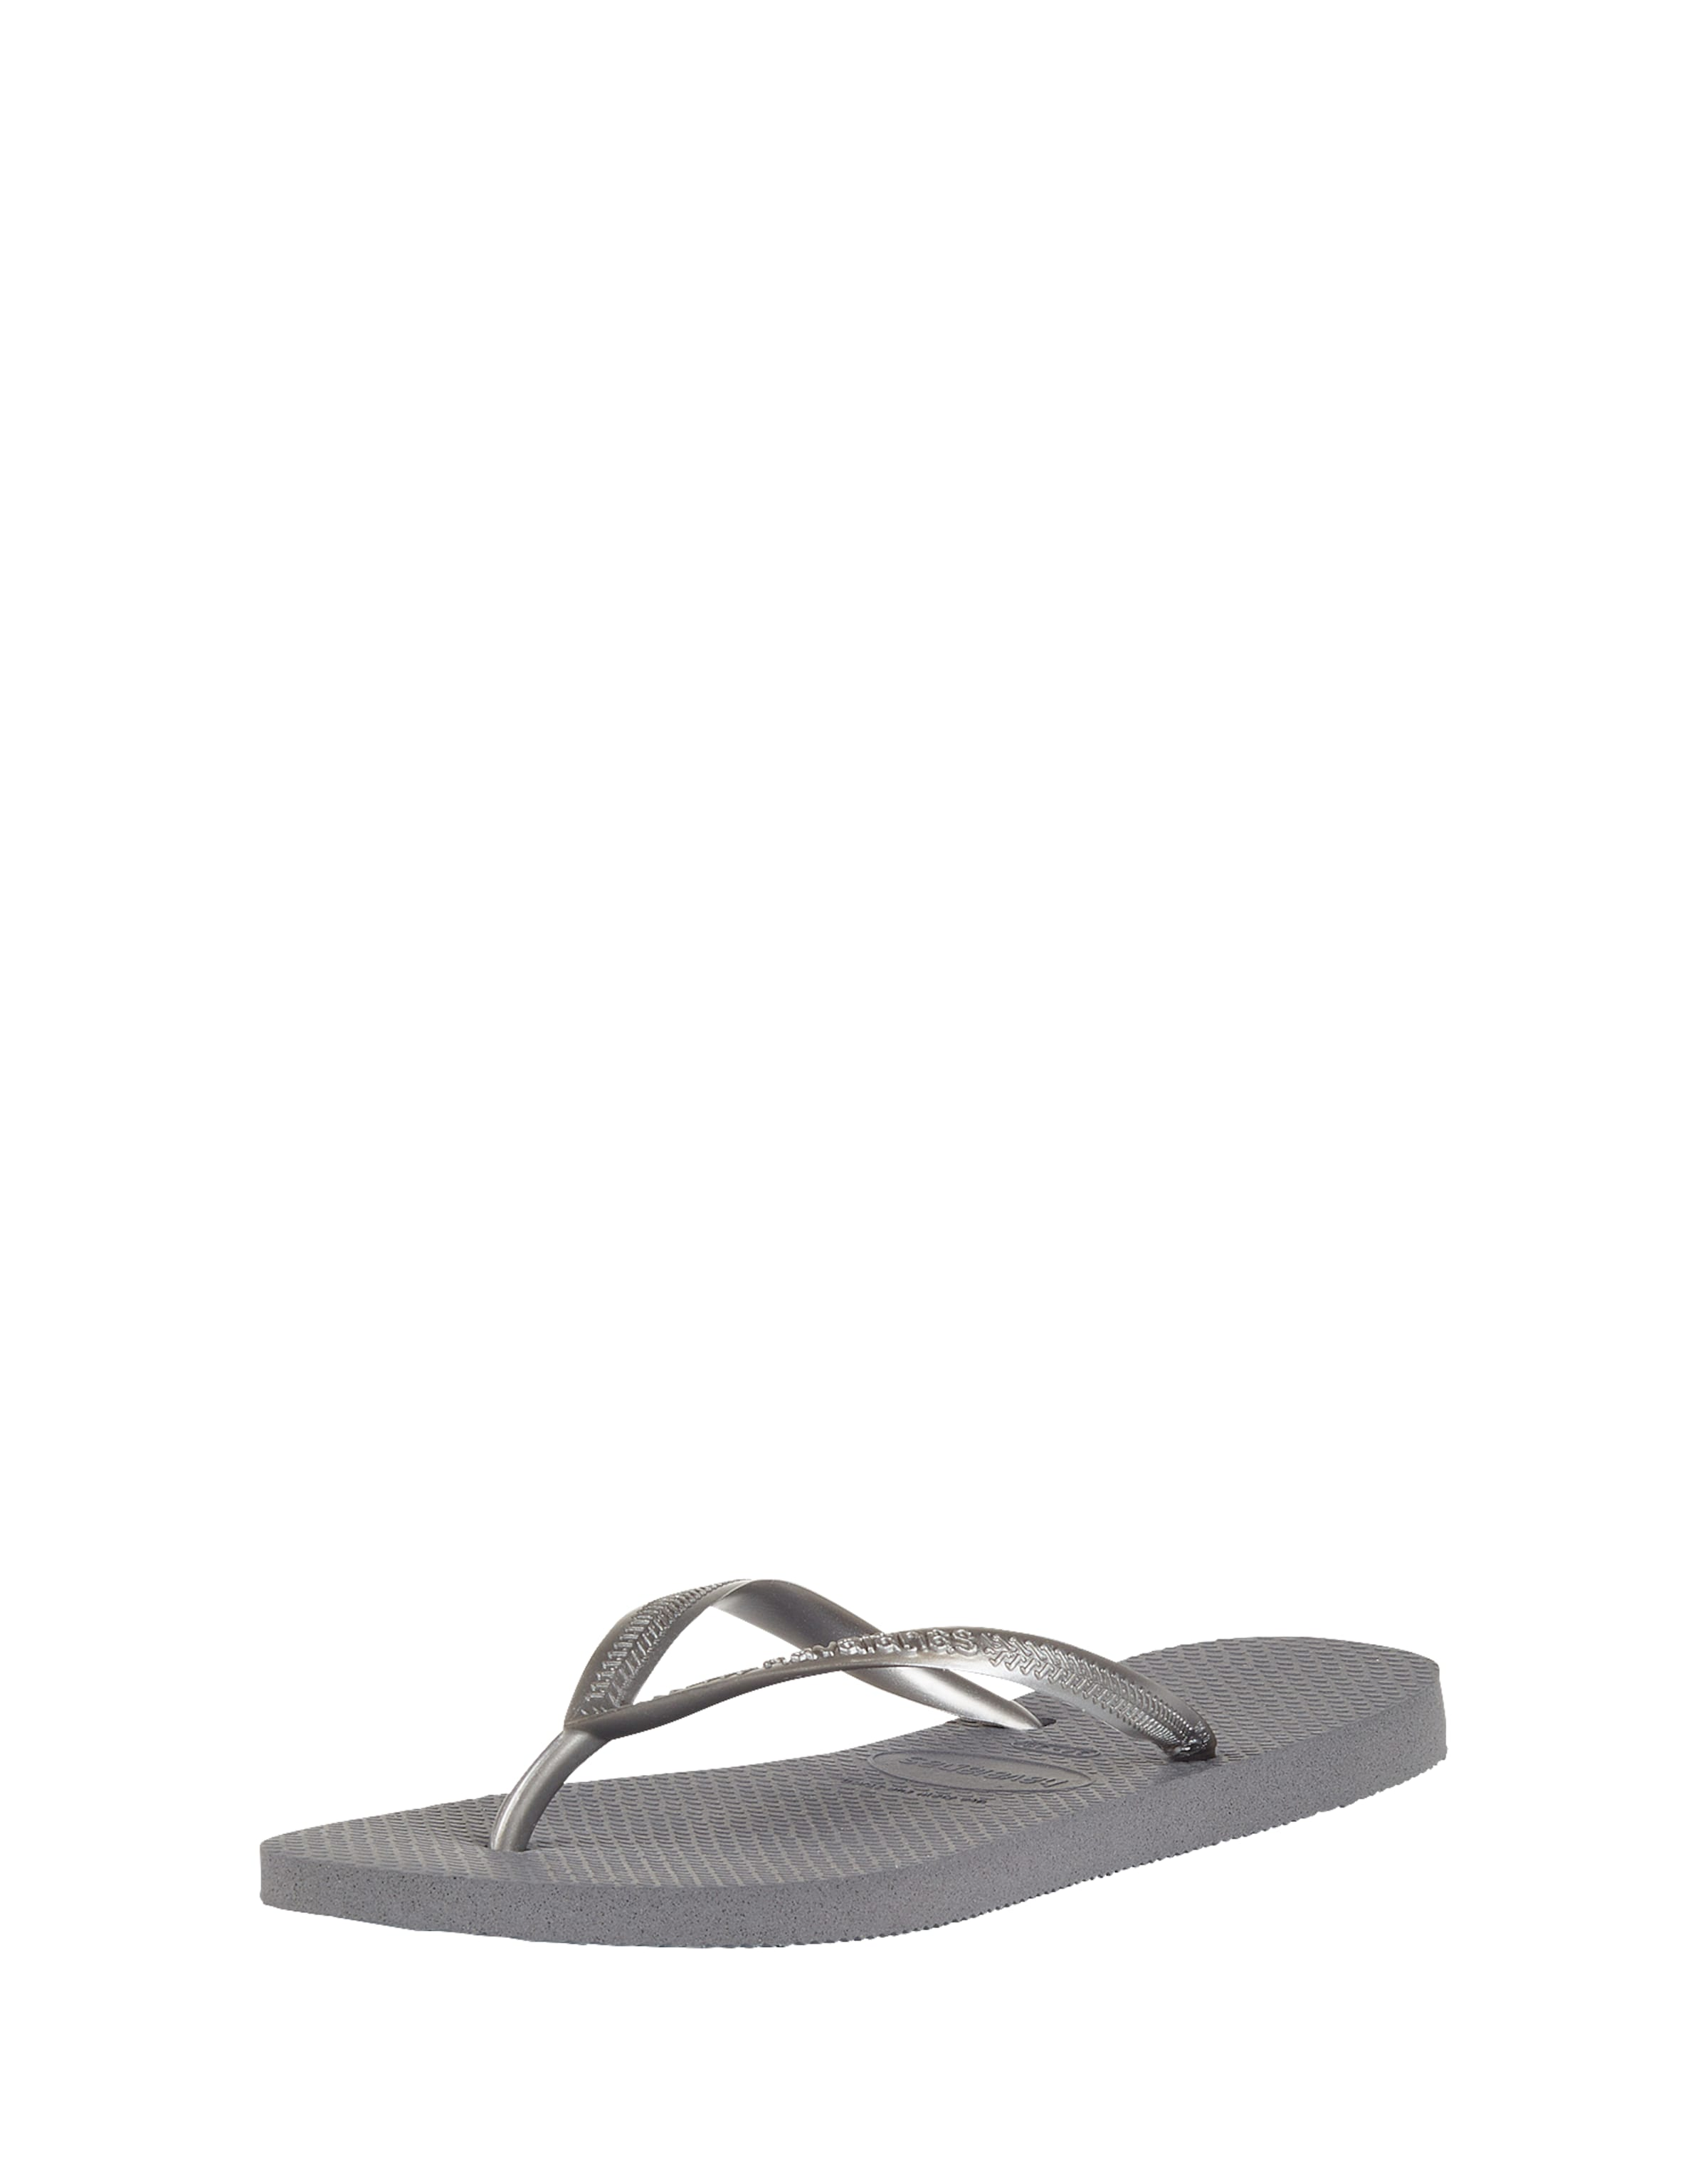 Haltbare Mode billige Schuhe HAVAIANAS | Zehensandale 'Slim' Schuhe Gut getragene Schuhe